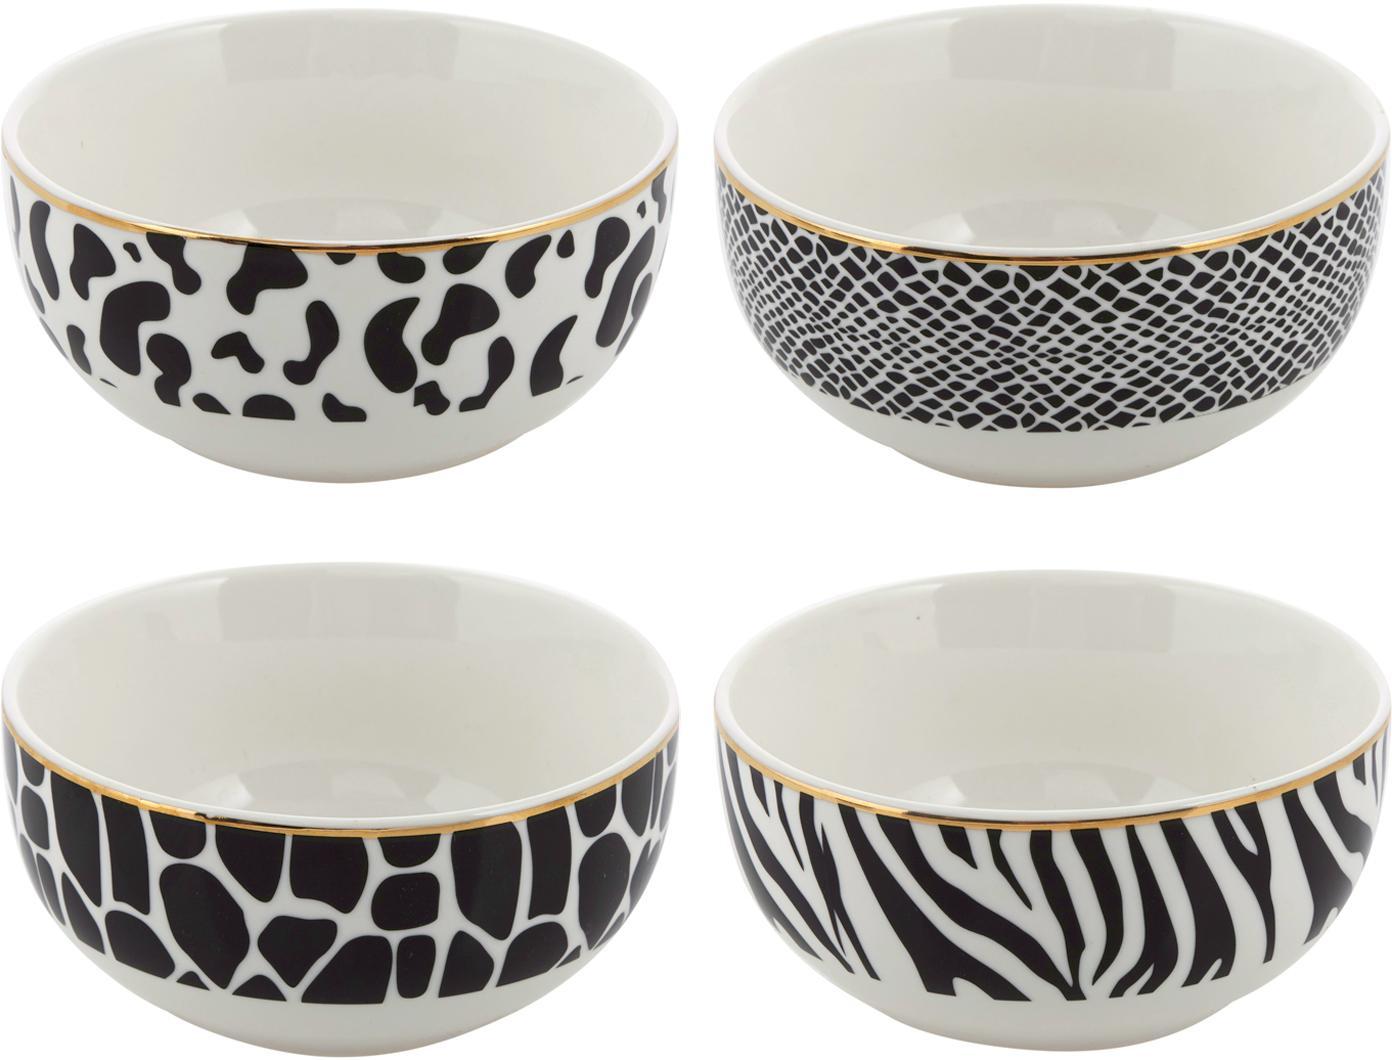 Komplet misek Wild Jungle, 4 elem., Porcelana, Czarny, biały, Ø 13 x W 7 cm